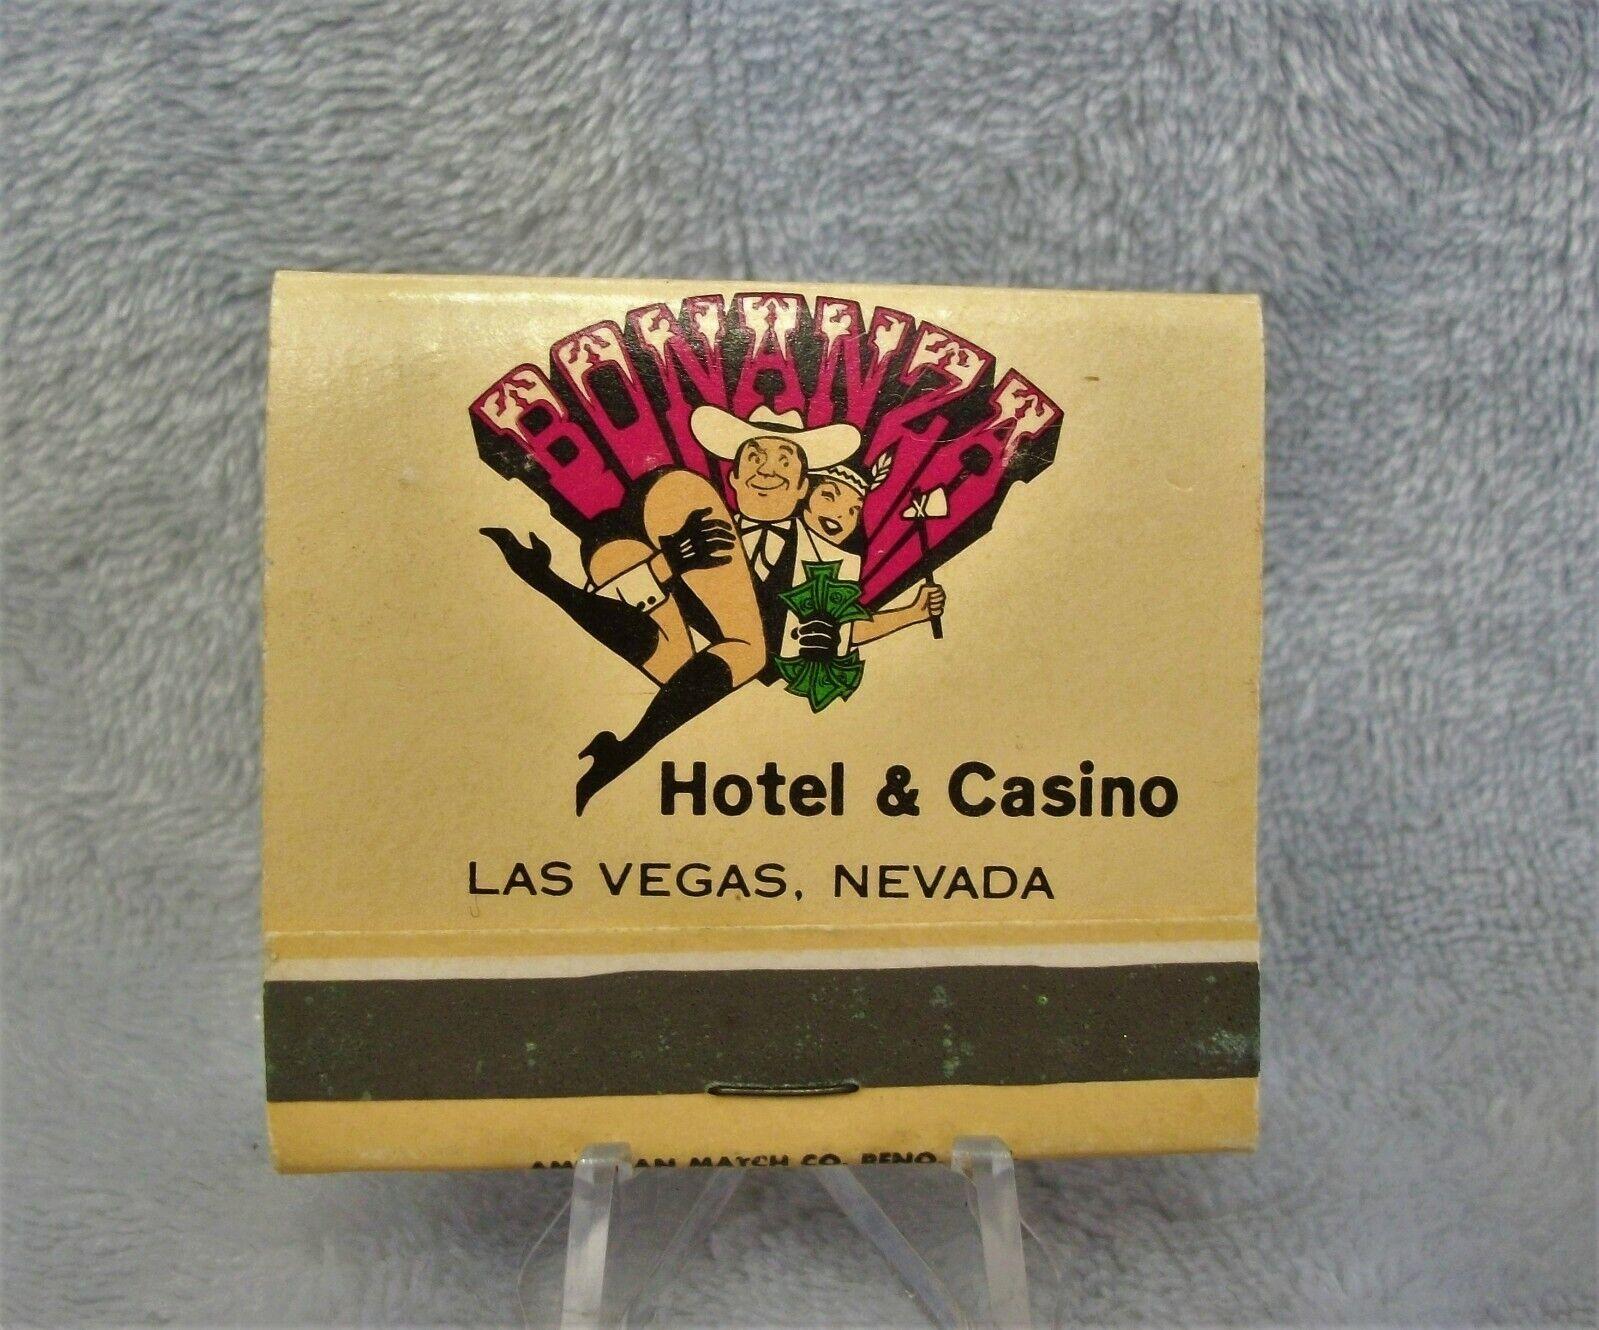 Details about  /Vintage Golden Nugget Hotel Casino Las Vegas Nevada matchbook  LQQK #6